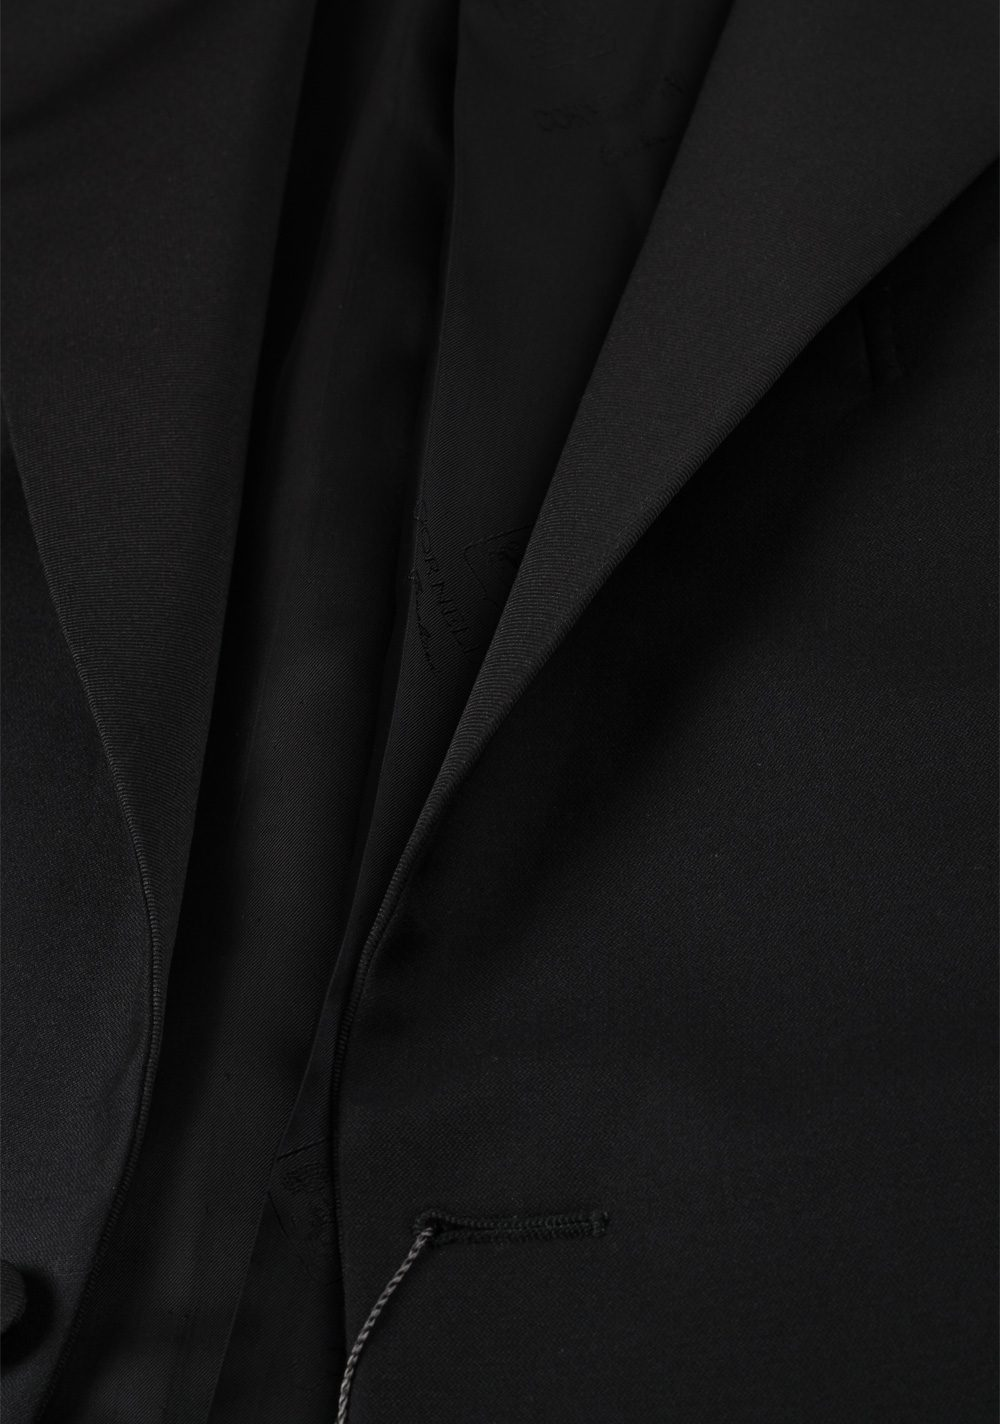 Corneliani Black Tuxedo Sport Coat Size 56L / 46L U.S. Super 140s | Costume Limité